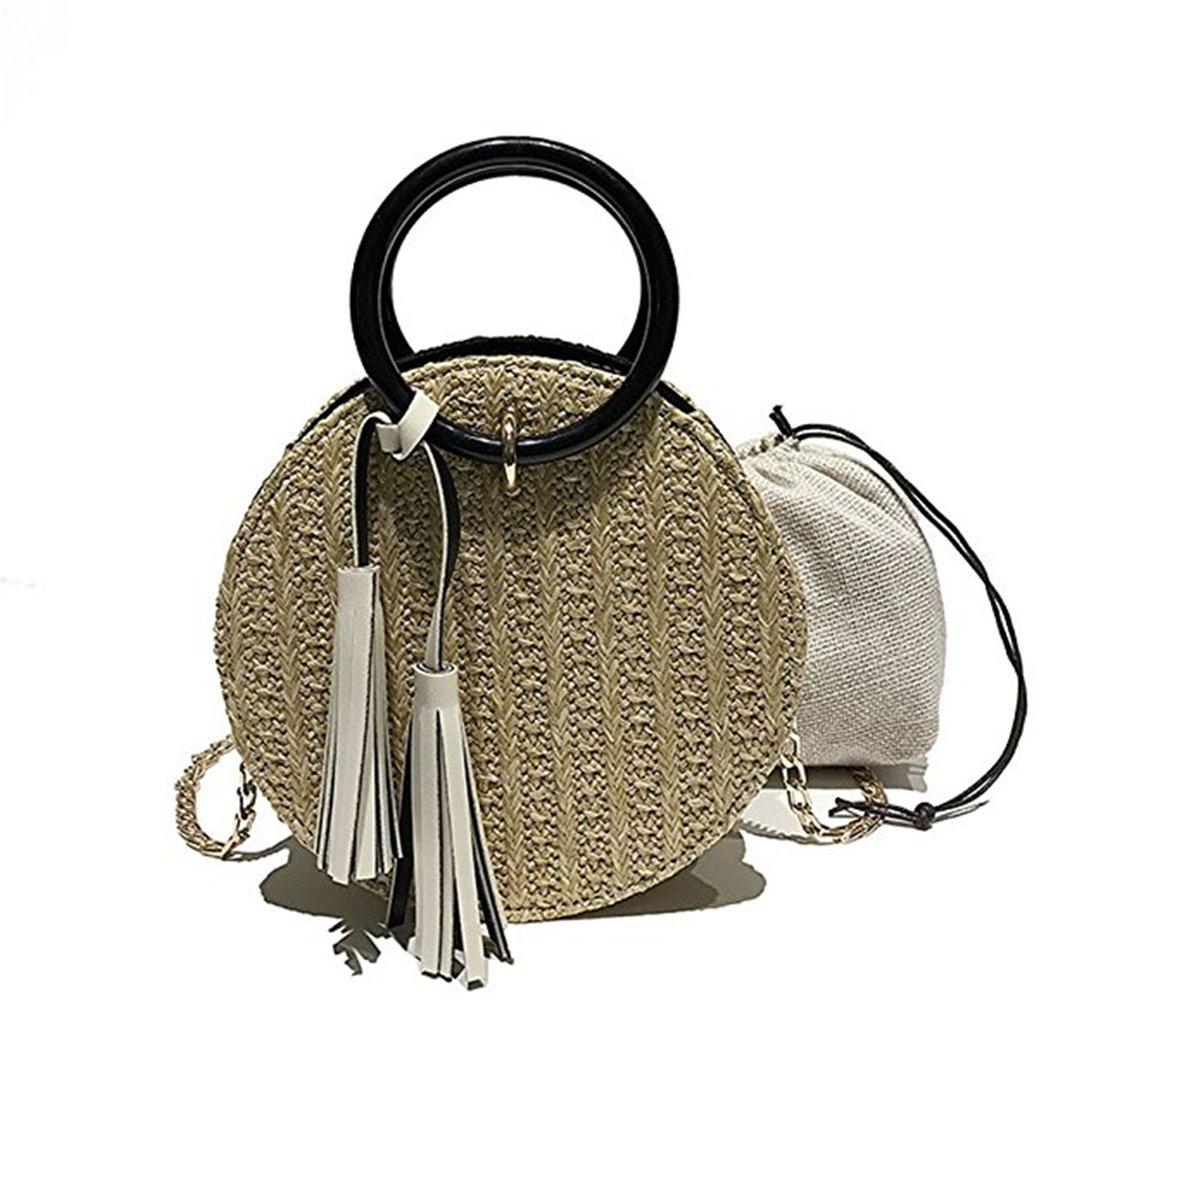 Women Straw Purse, JOSEKO Summer Beach Bag Circle Crossbody Bag Round Rattan Bag Shoulder Satchel Khaki 7.87''x 3.93''x 7.87''(LxWxH)